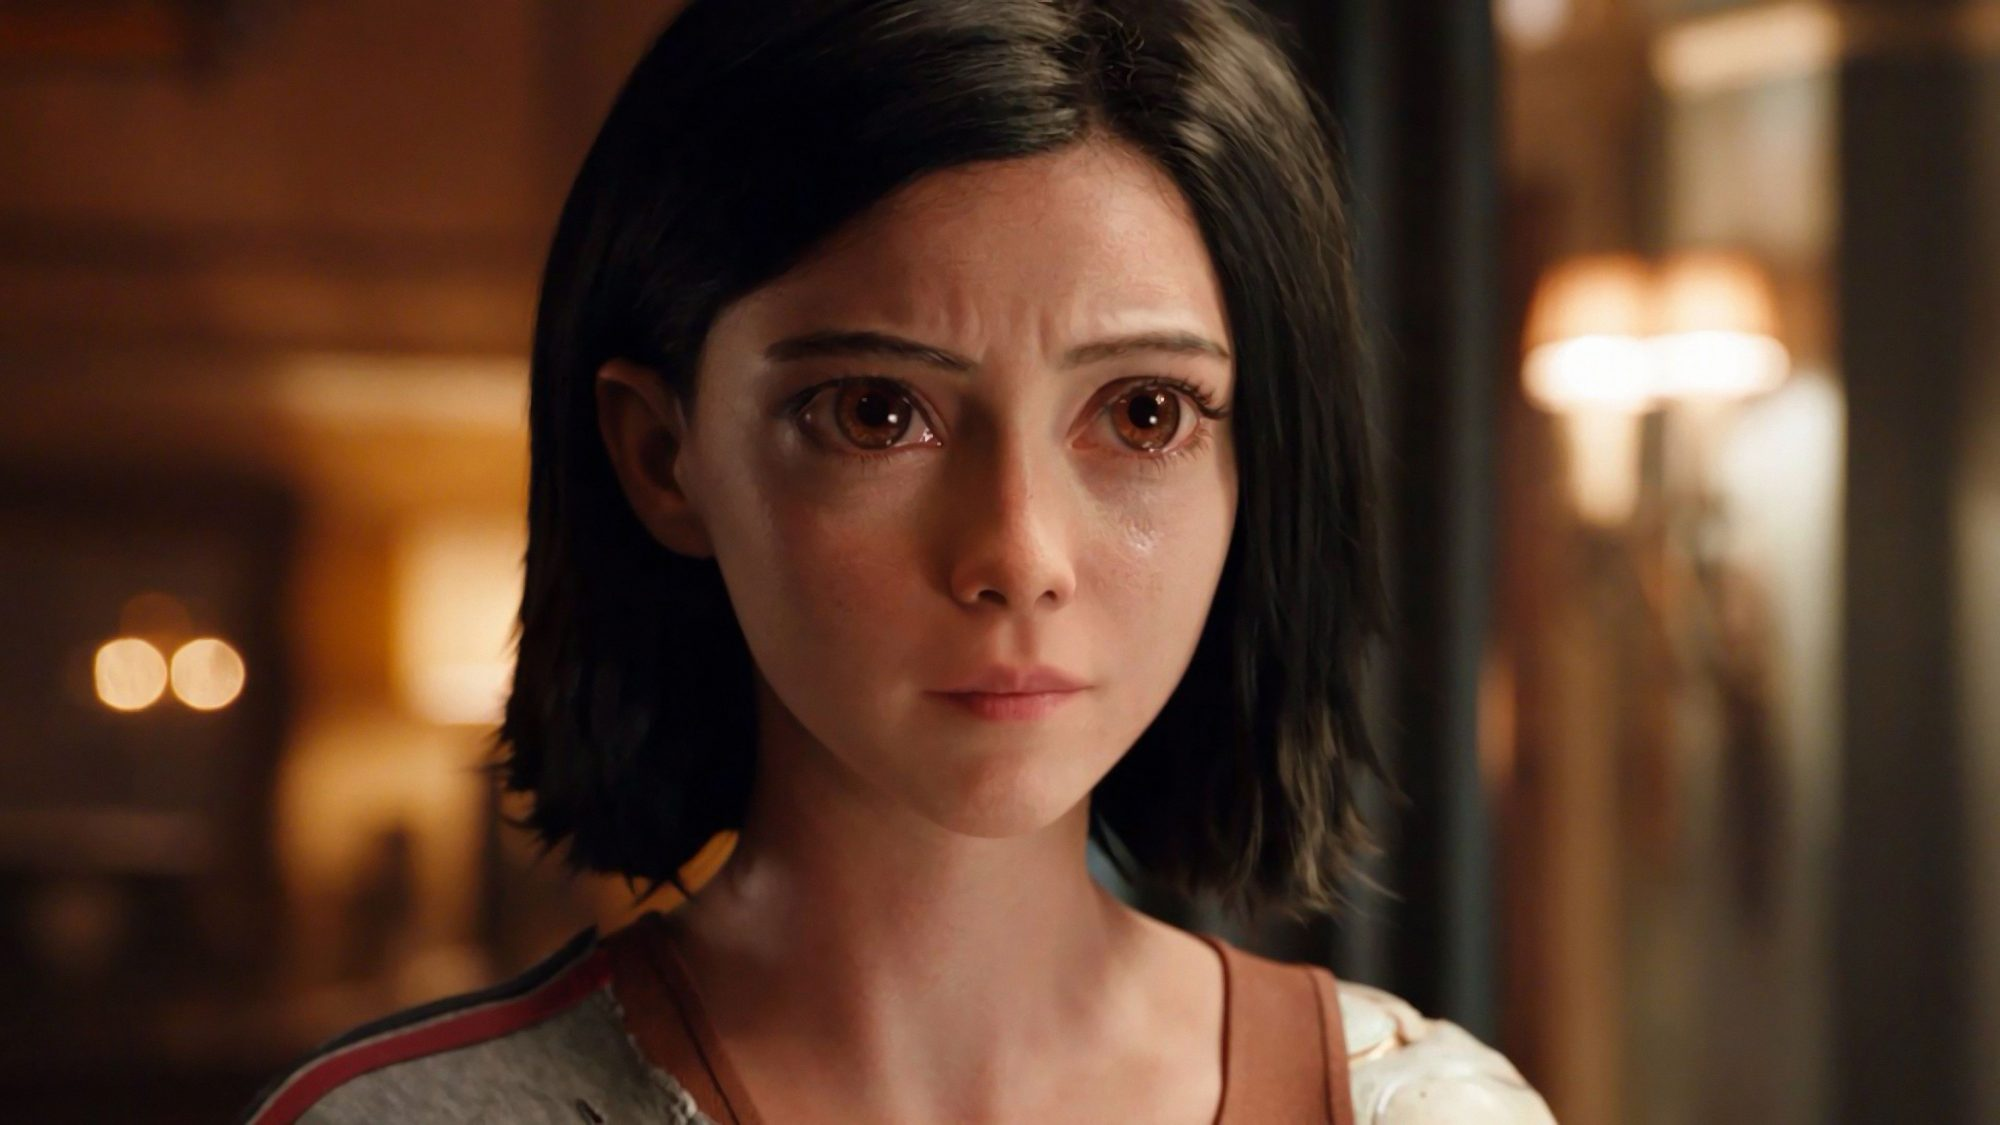 Rosa Salazar plays cyborg Alita in Alita Battle Angel